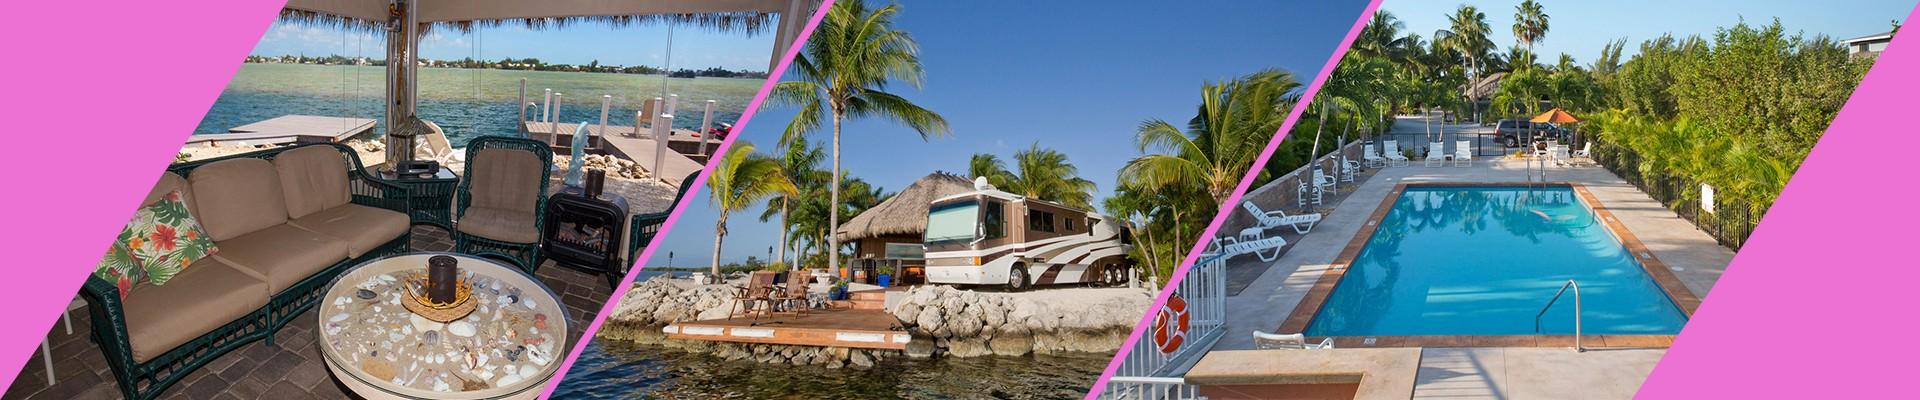 Bluewater Key RV Resort in Key West, Florida